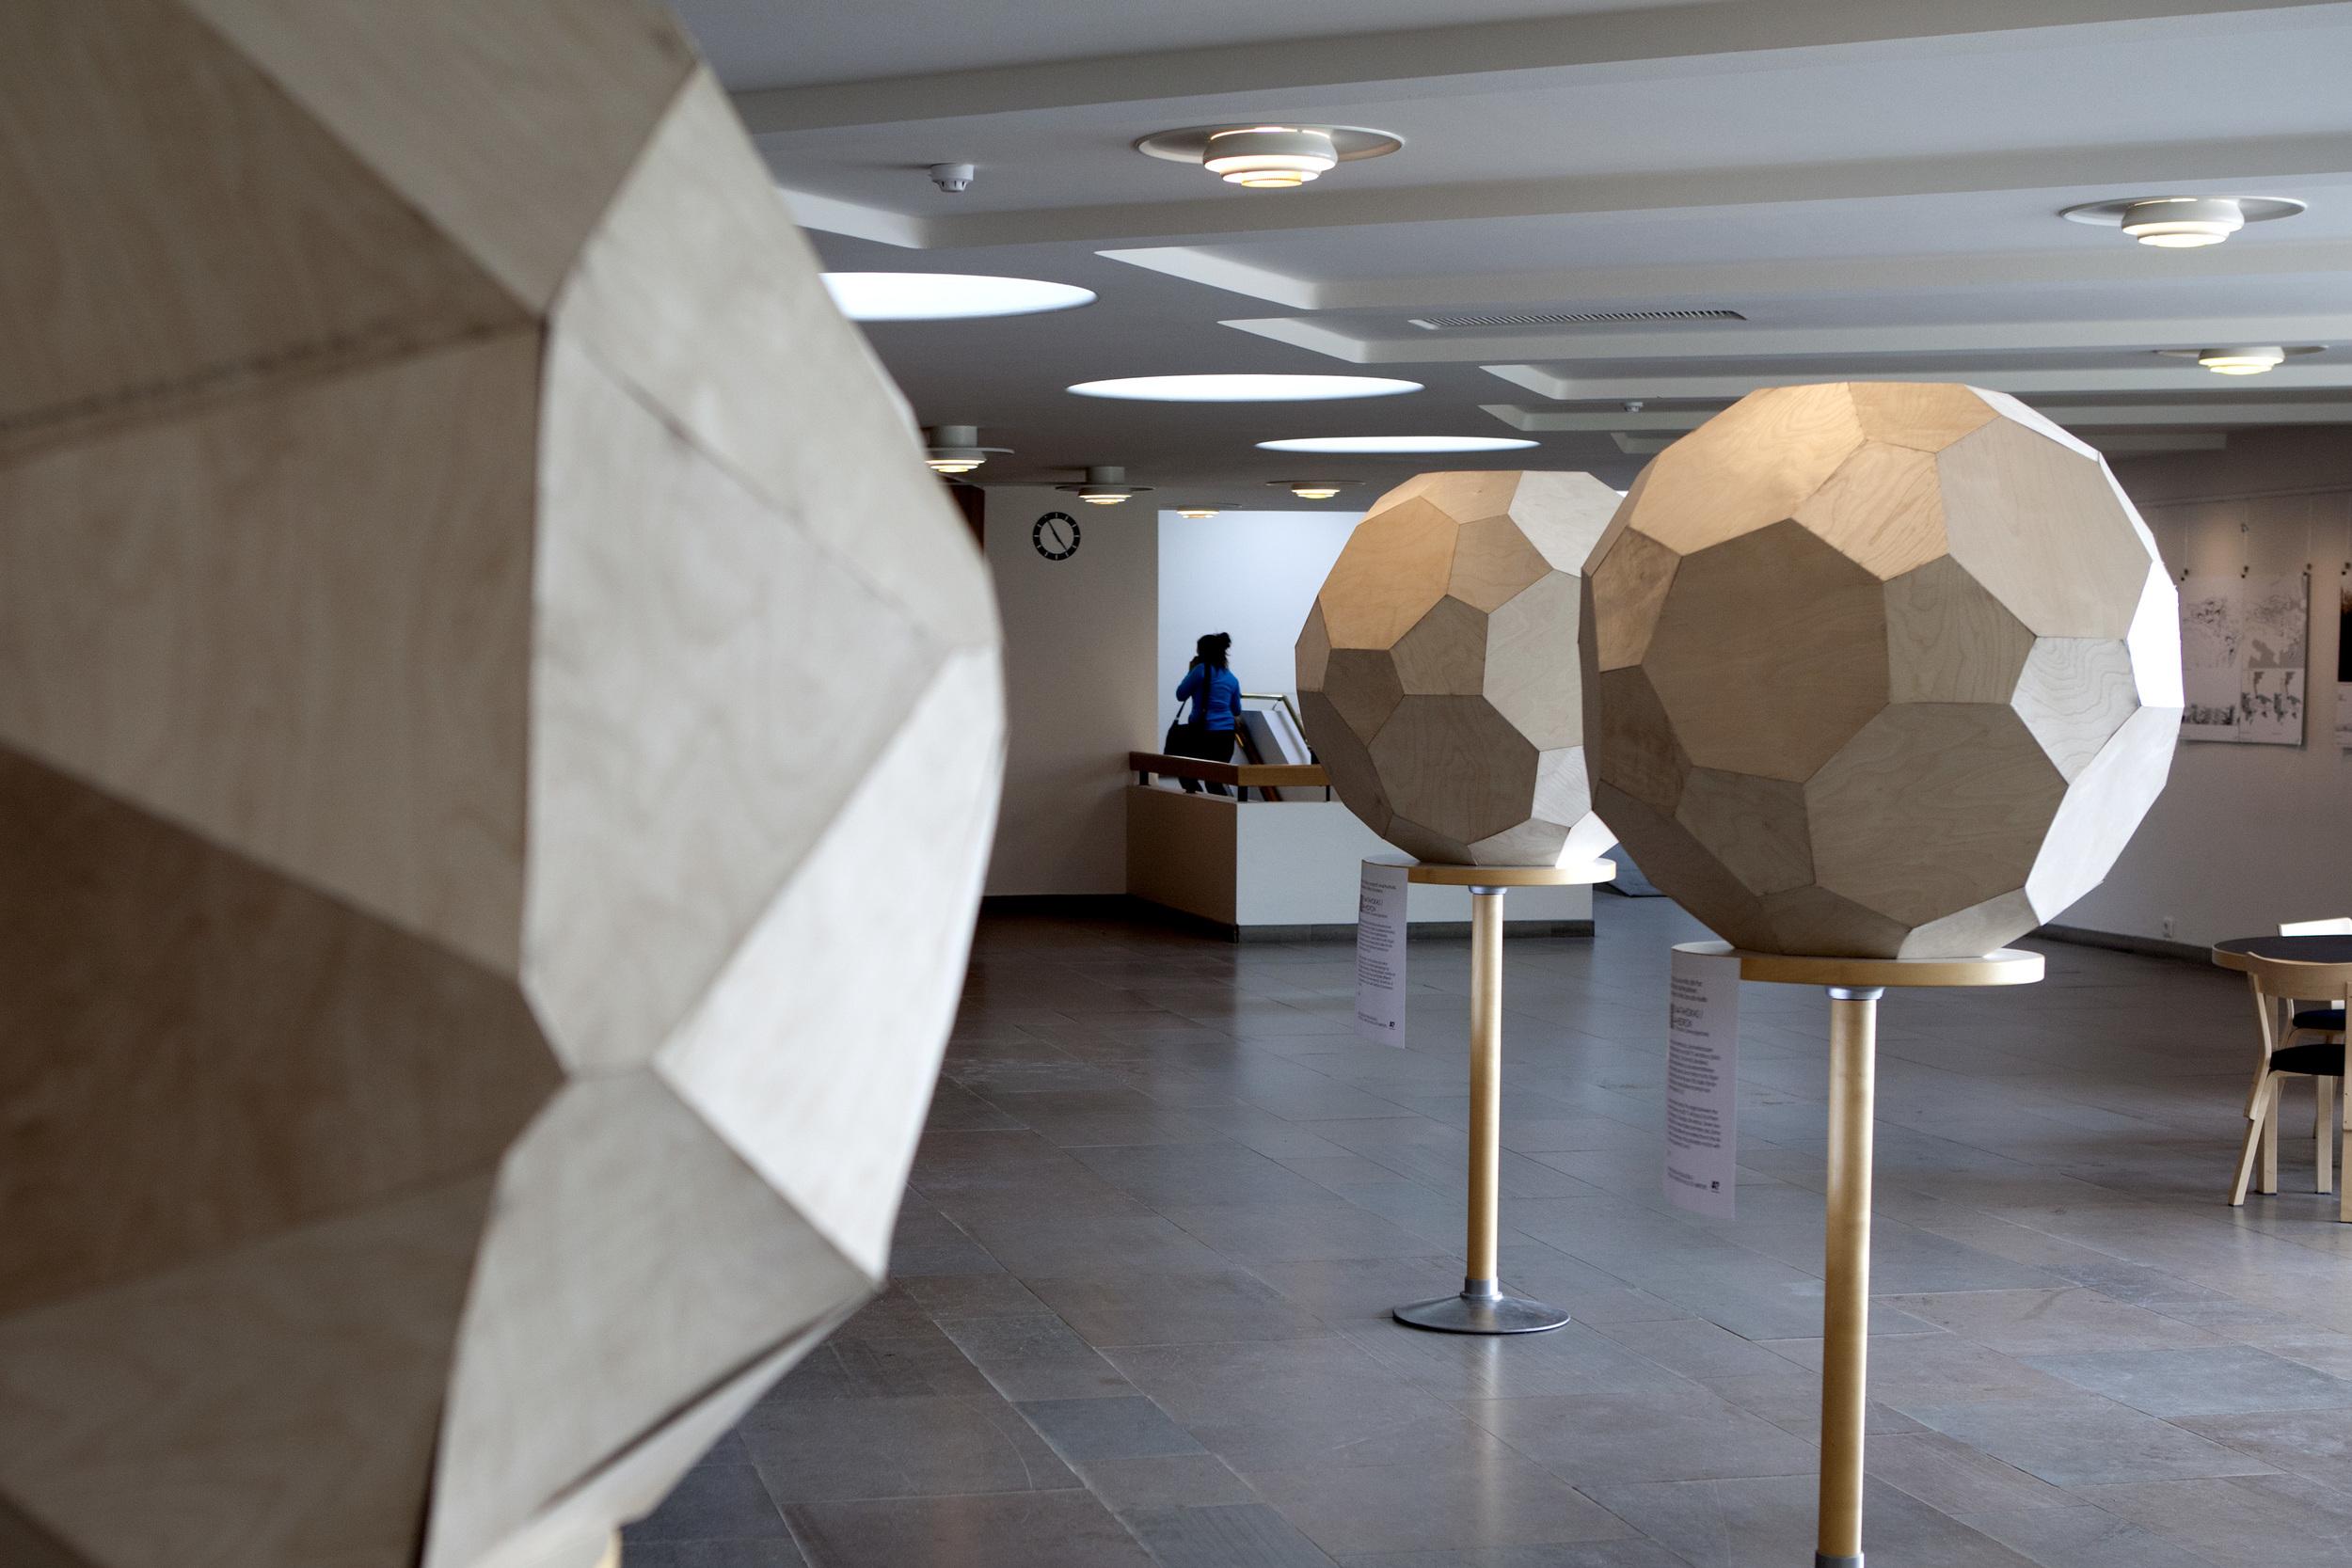 Polyhedrons / photo: Adolfo Vera